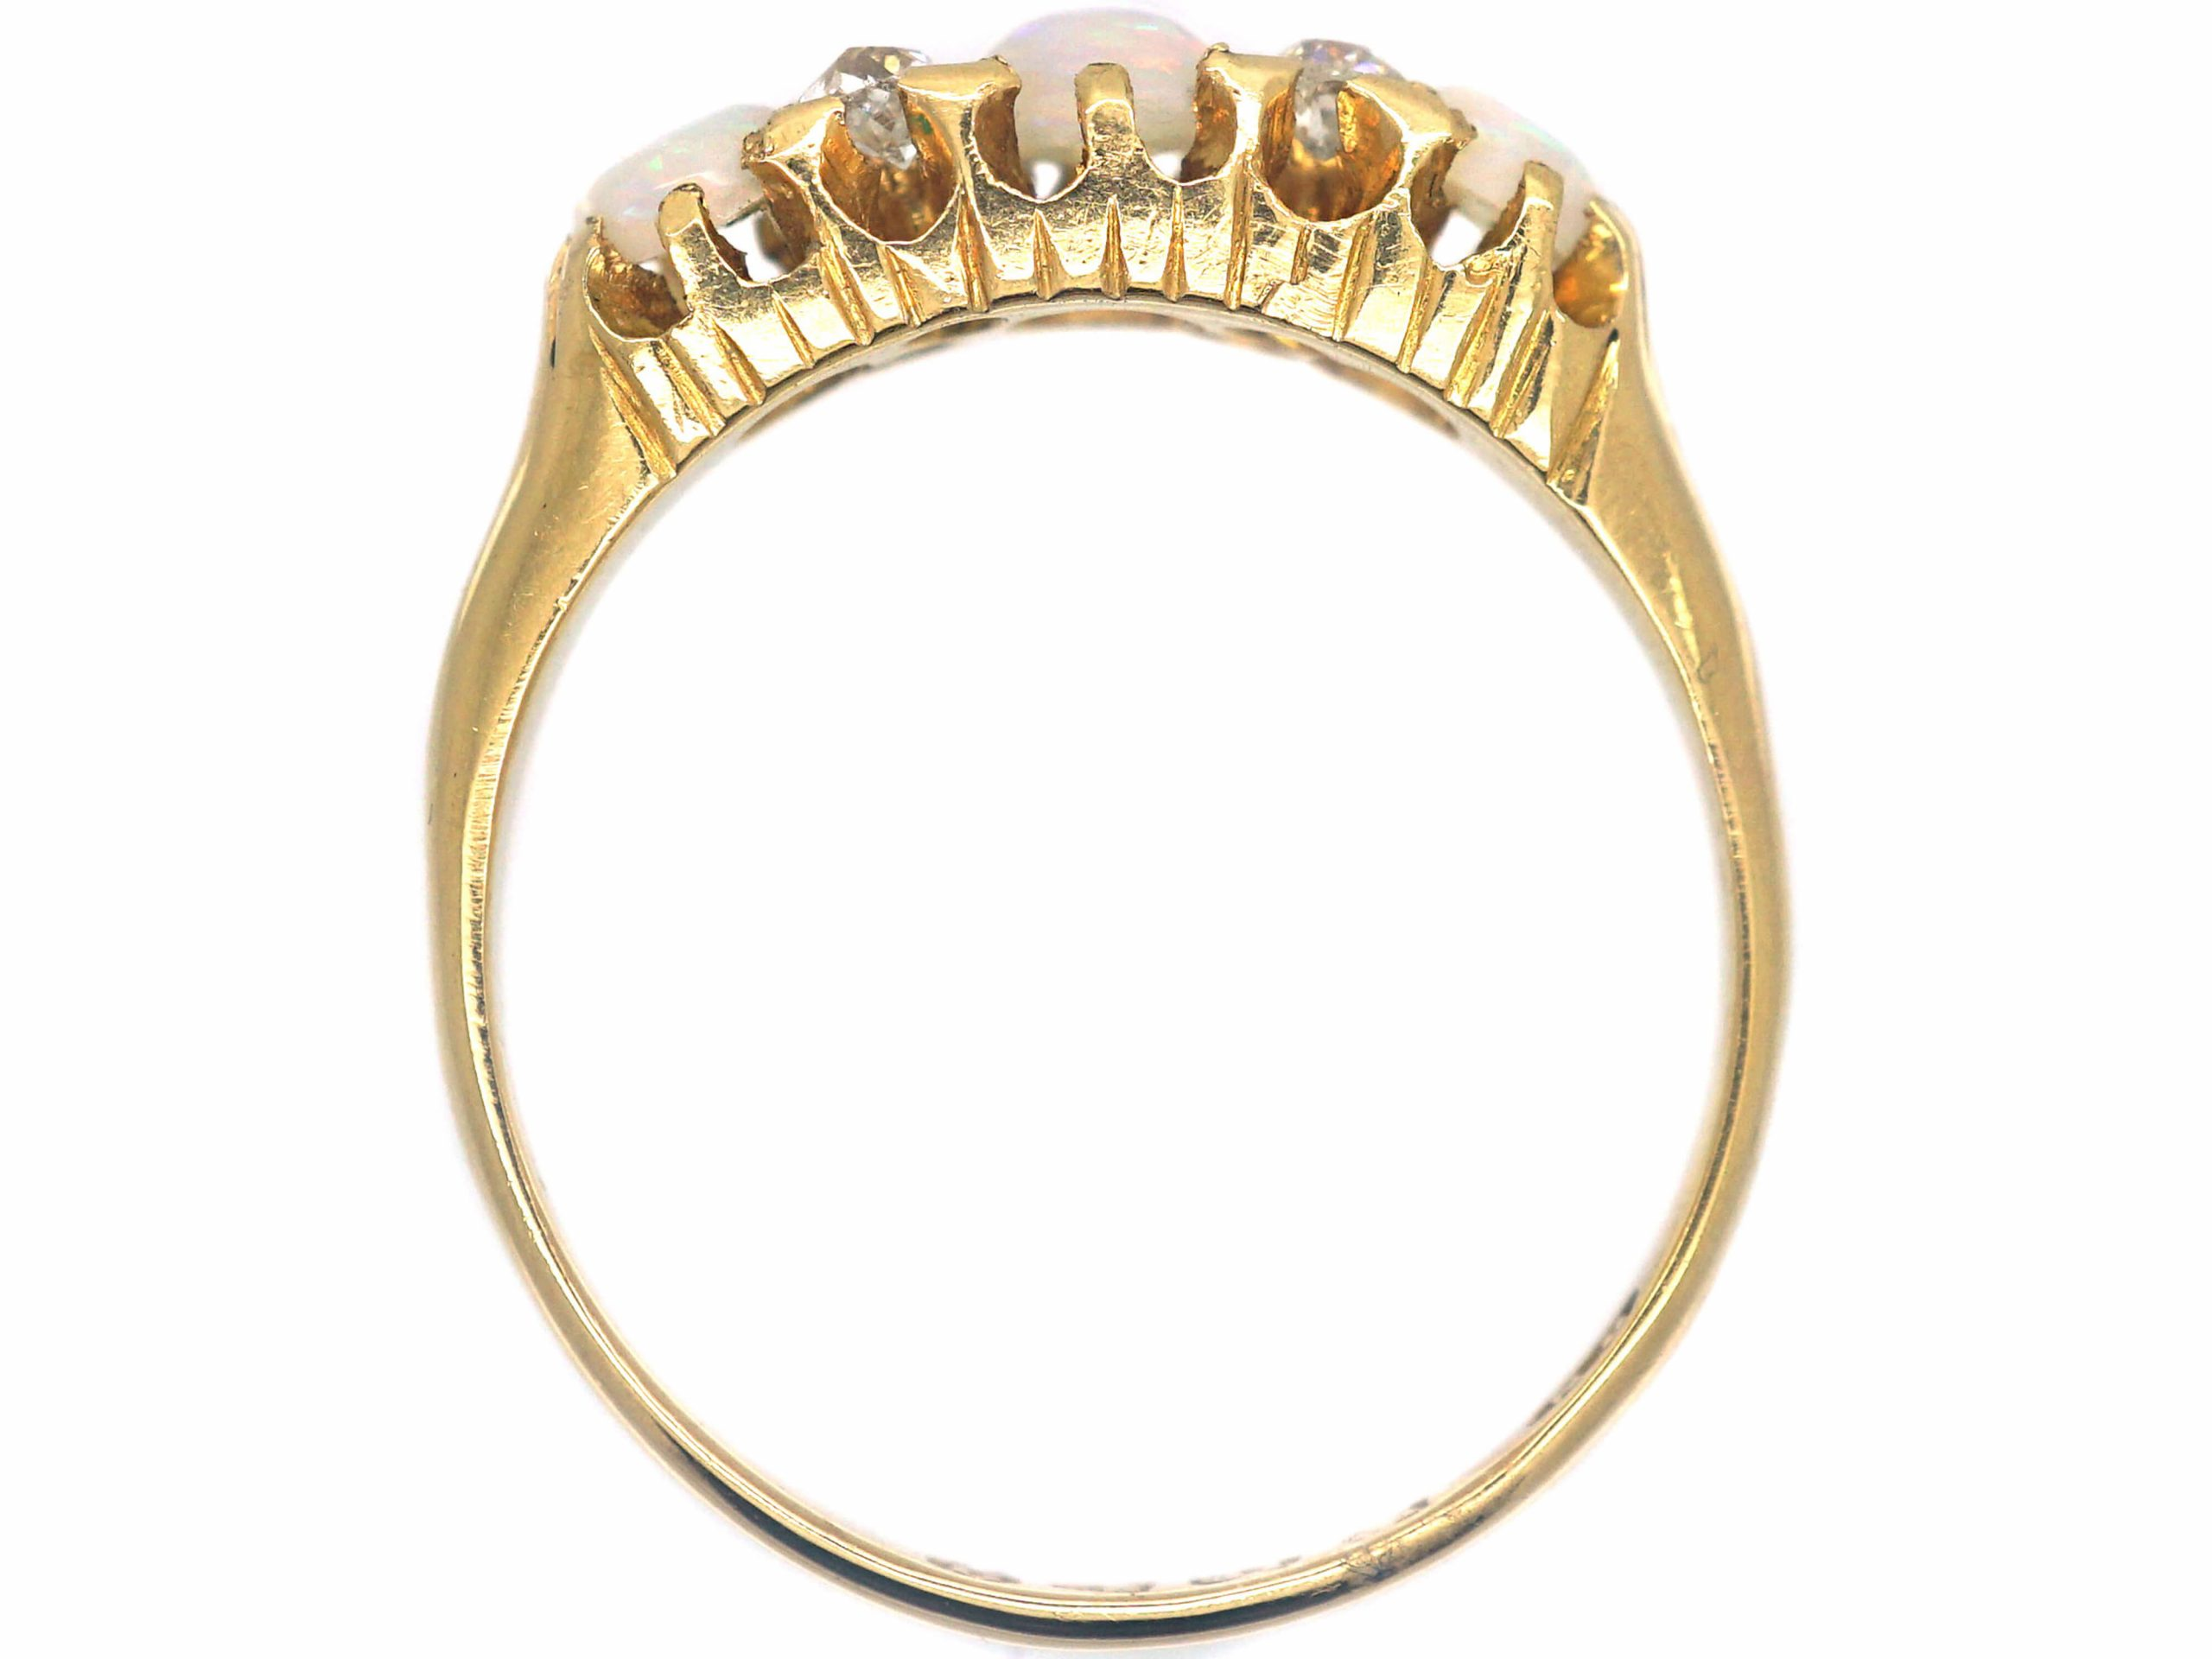 Victorian 18ct Gold, Three Stone Opal & Diamond Ring